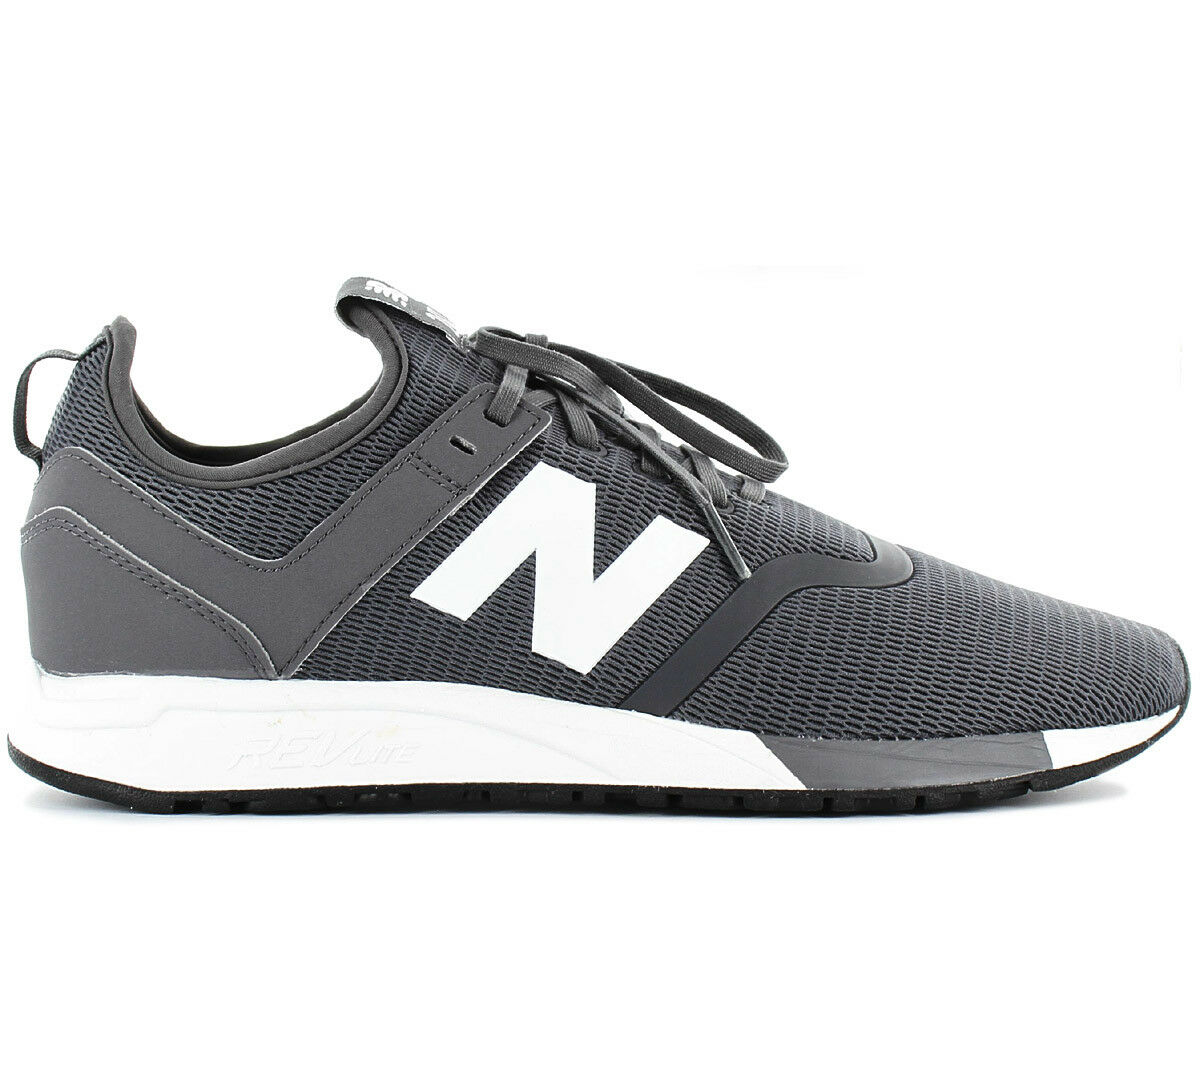 New Balance Lifestyle 247 mrl247d1 hommes Turnchaussures chaussures chaussures De Sport chaussures